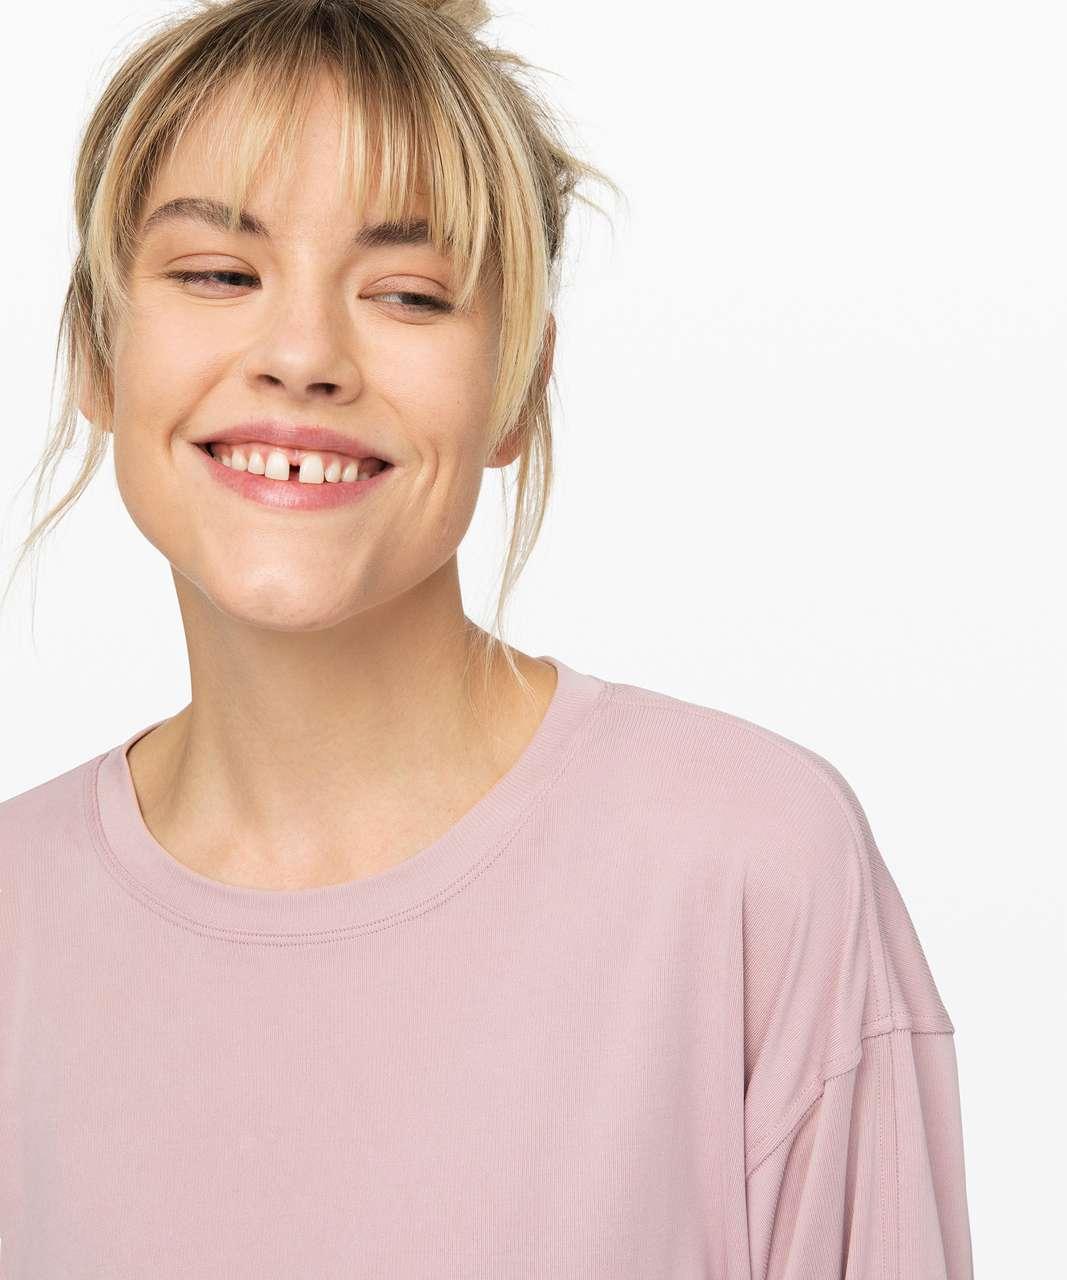 Lululemon Loungeful Drape Long Sleeve *Cupro - Smoky Blush